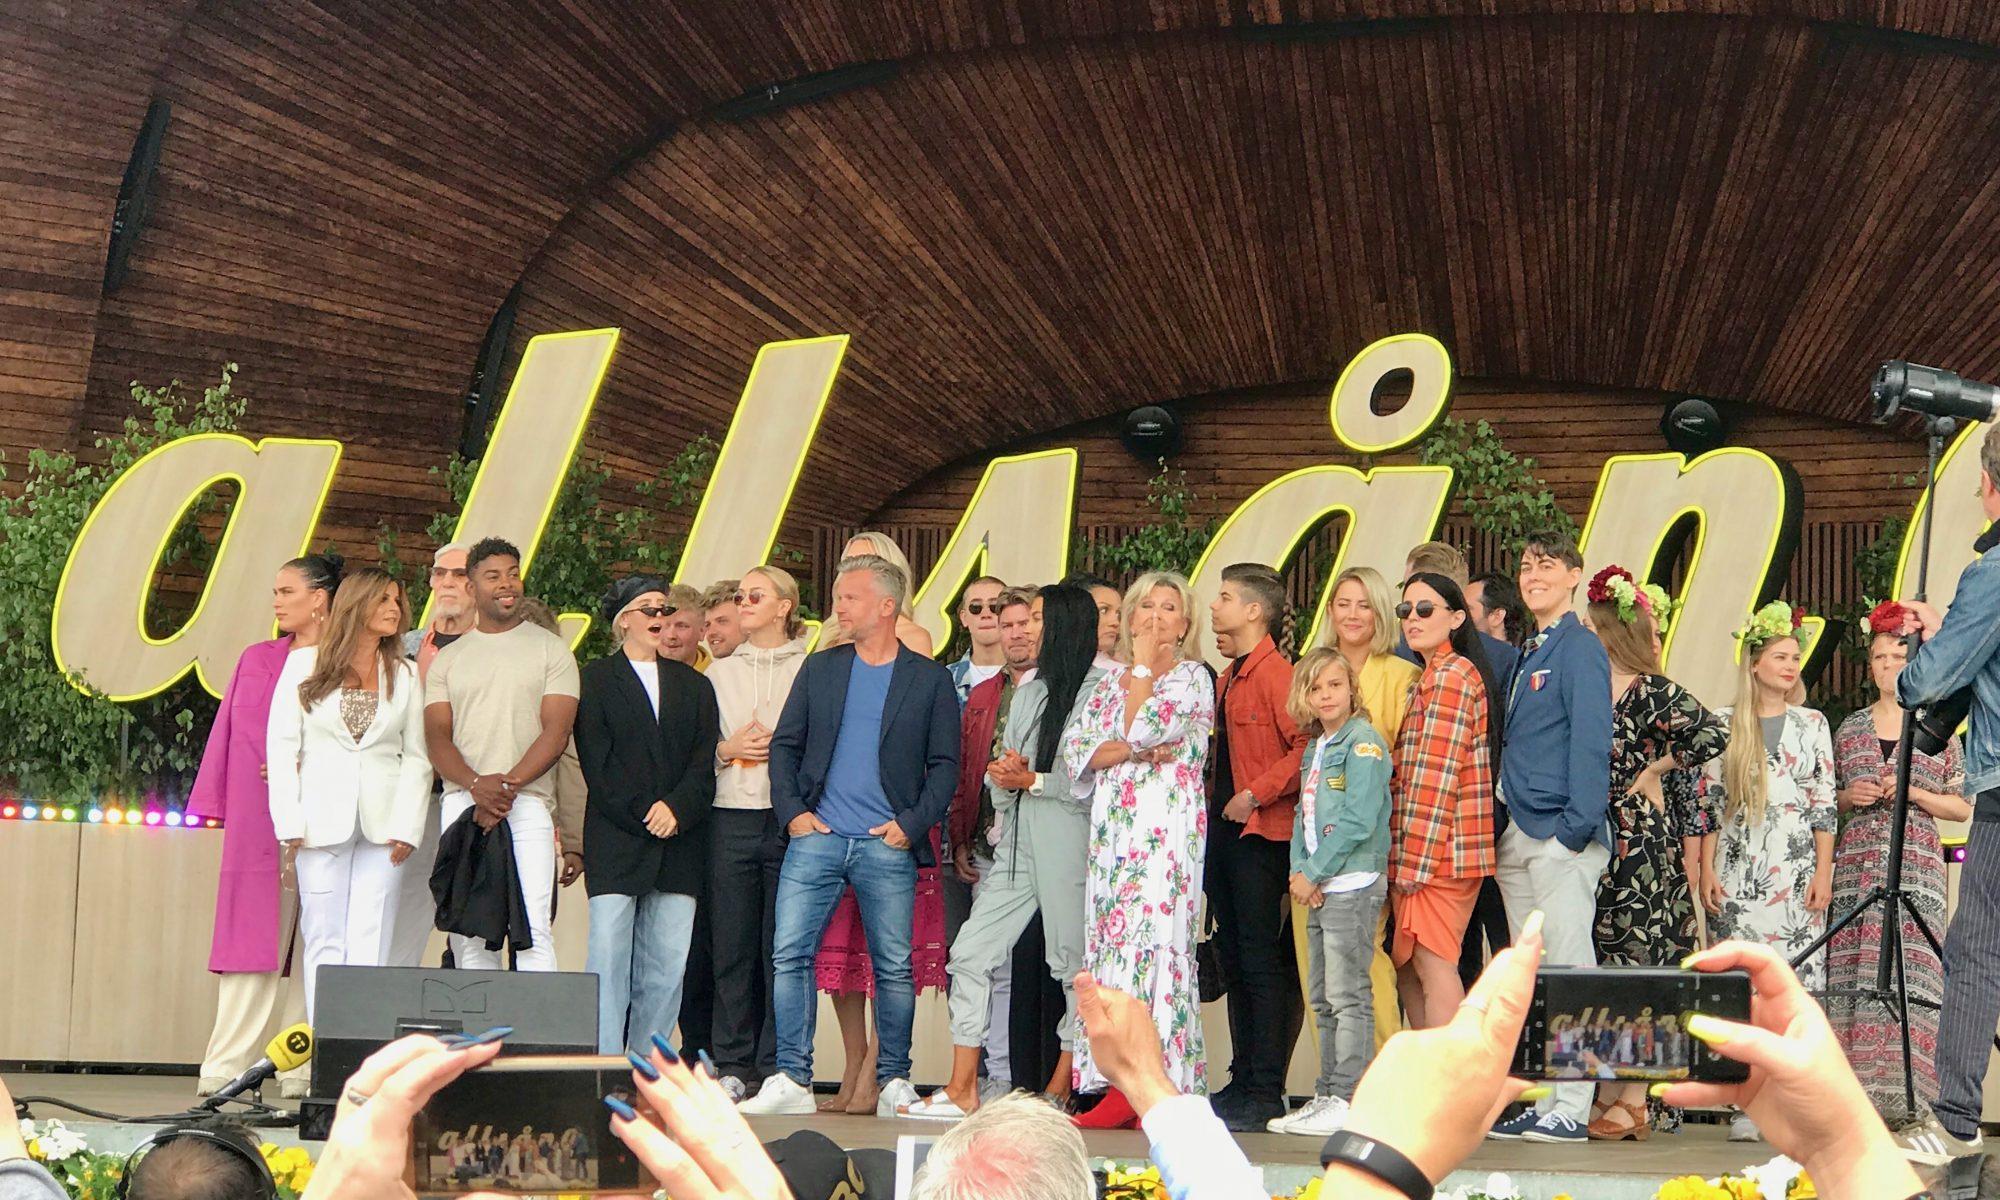 Sing-along at Skansen 2019